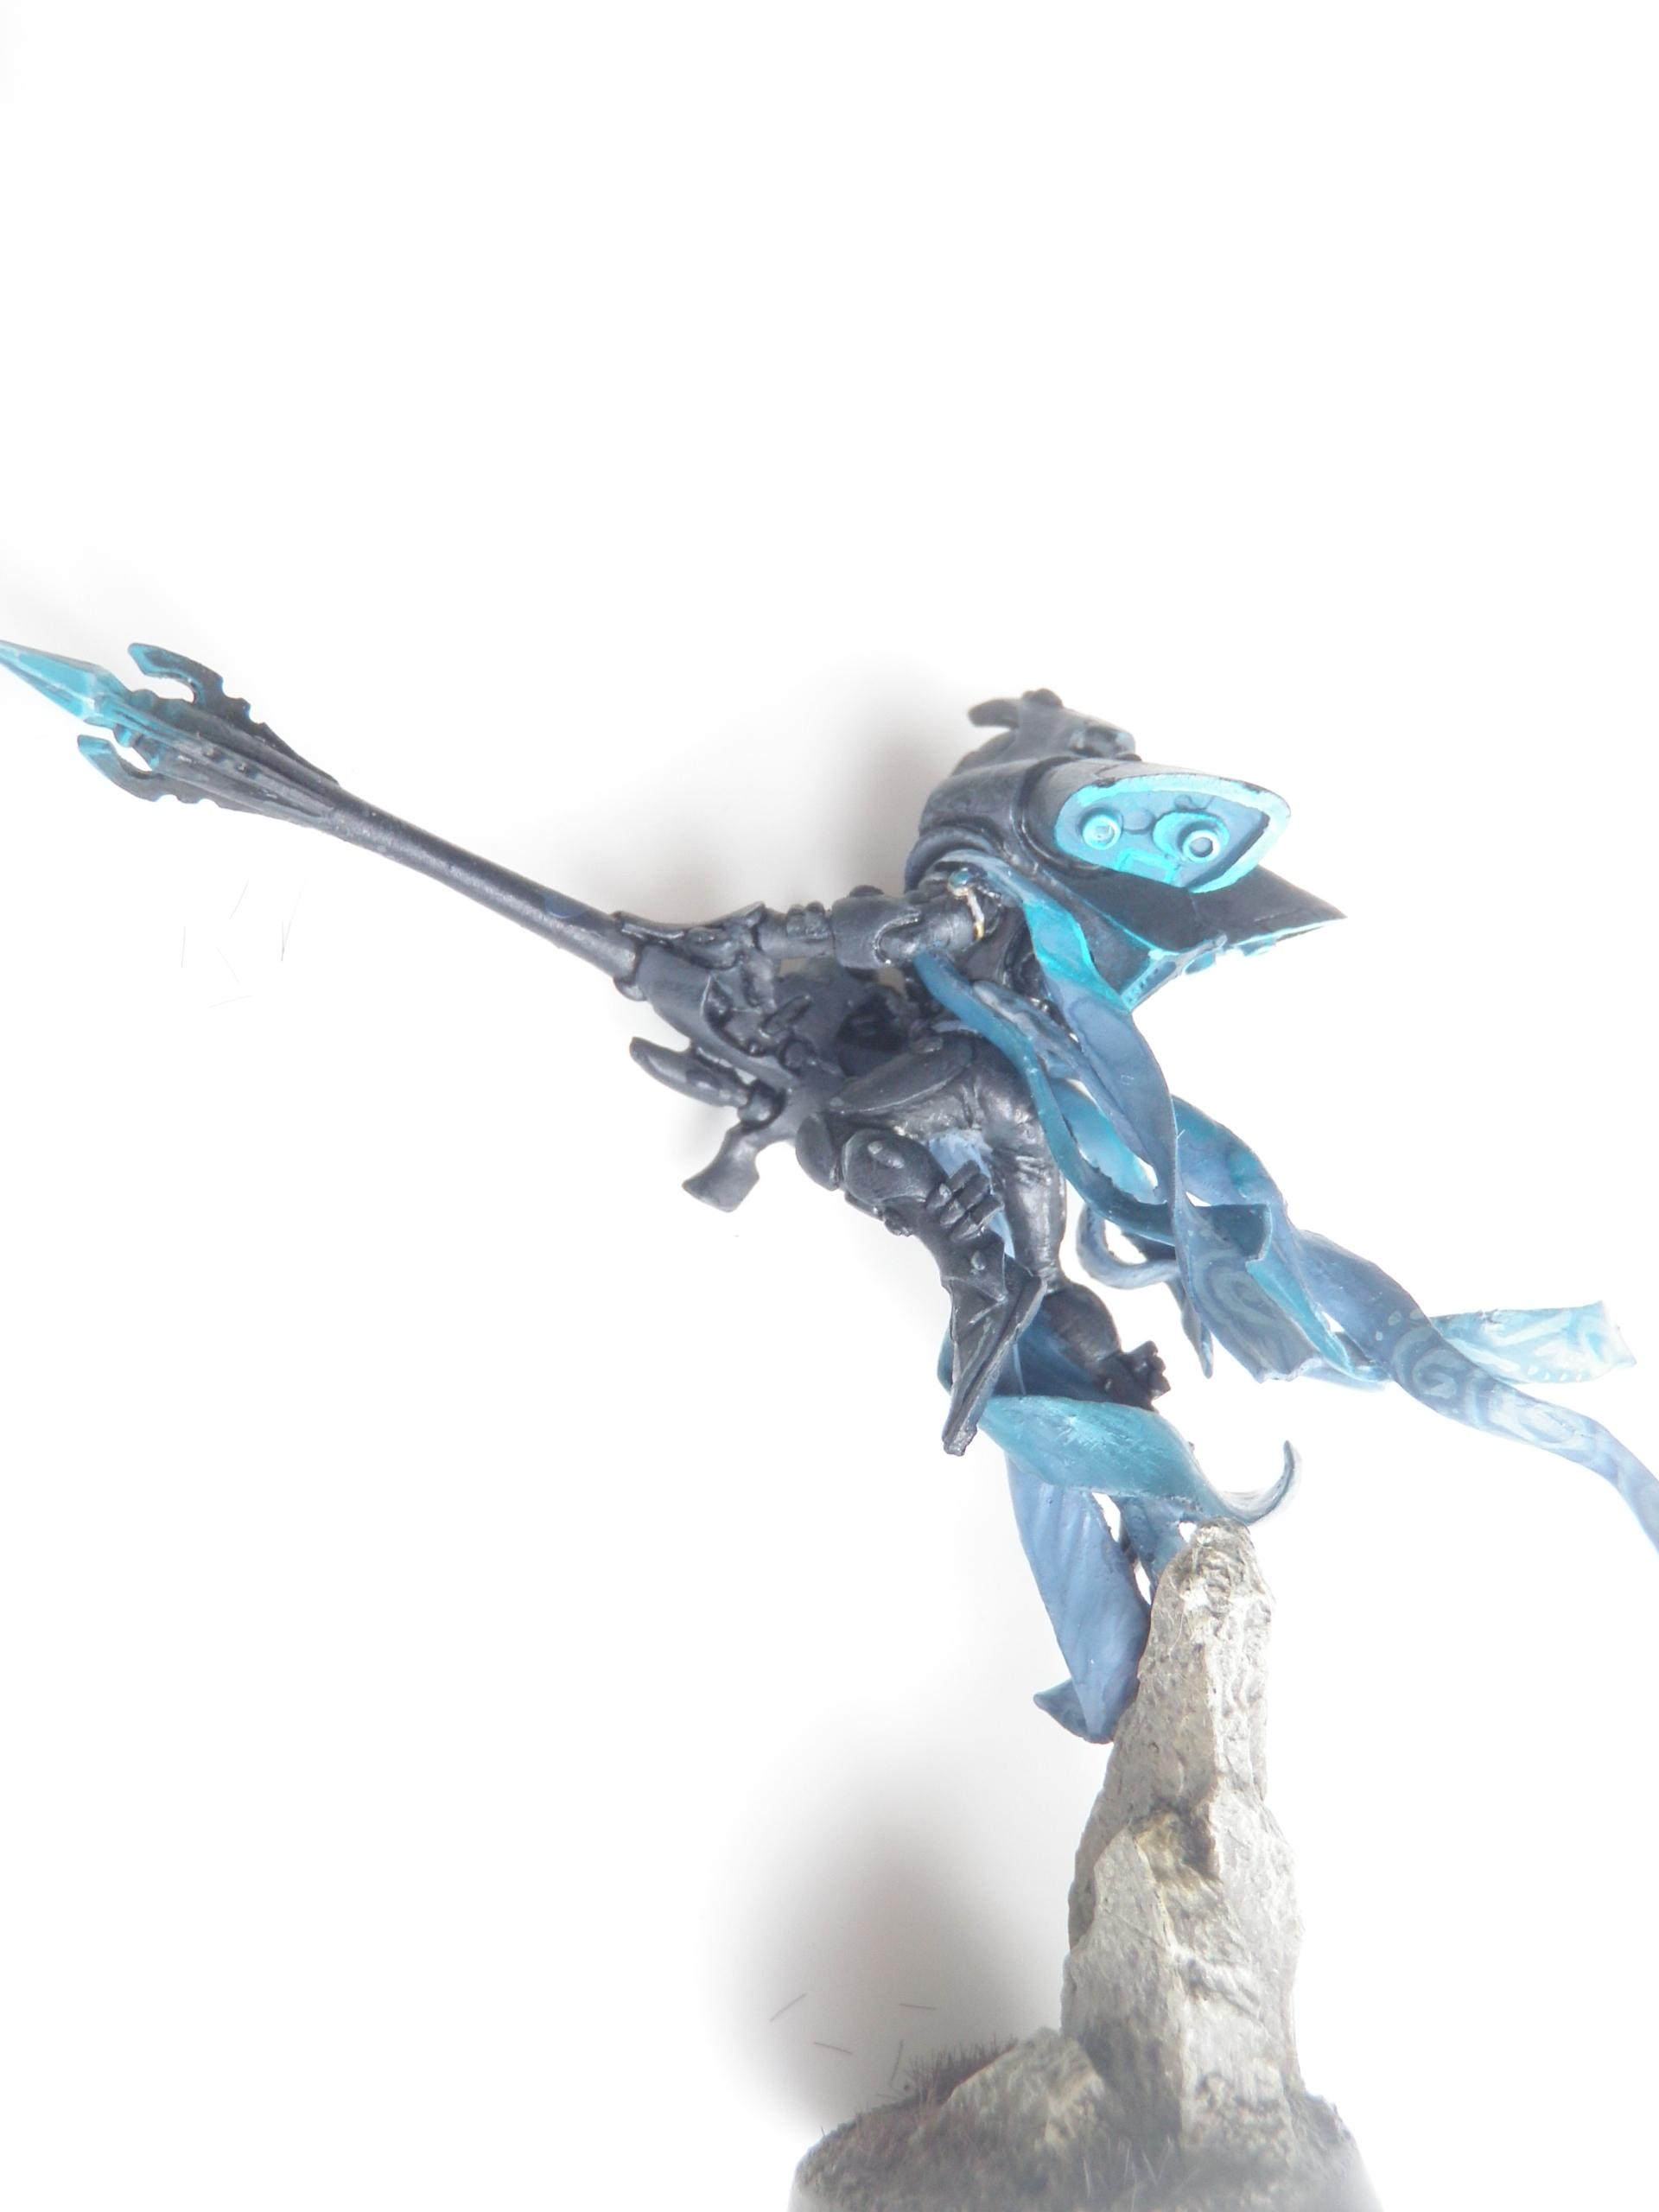 Aspect Warrior, Eldar, Shadow Spectres, Spectres, Warhammer 40,000